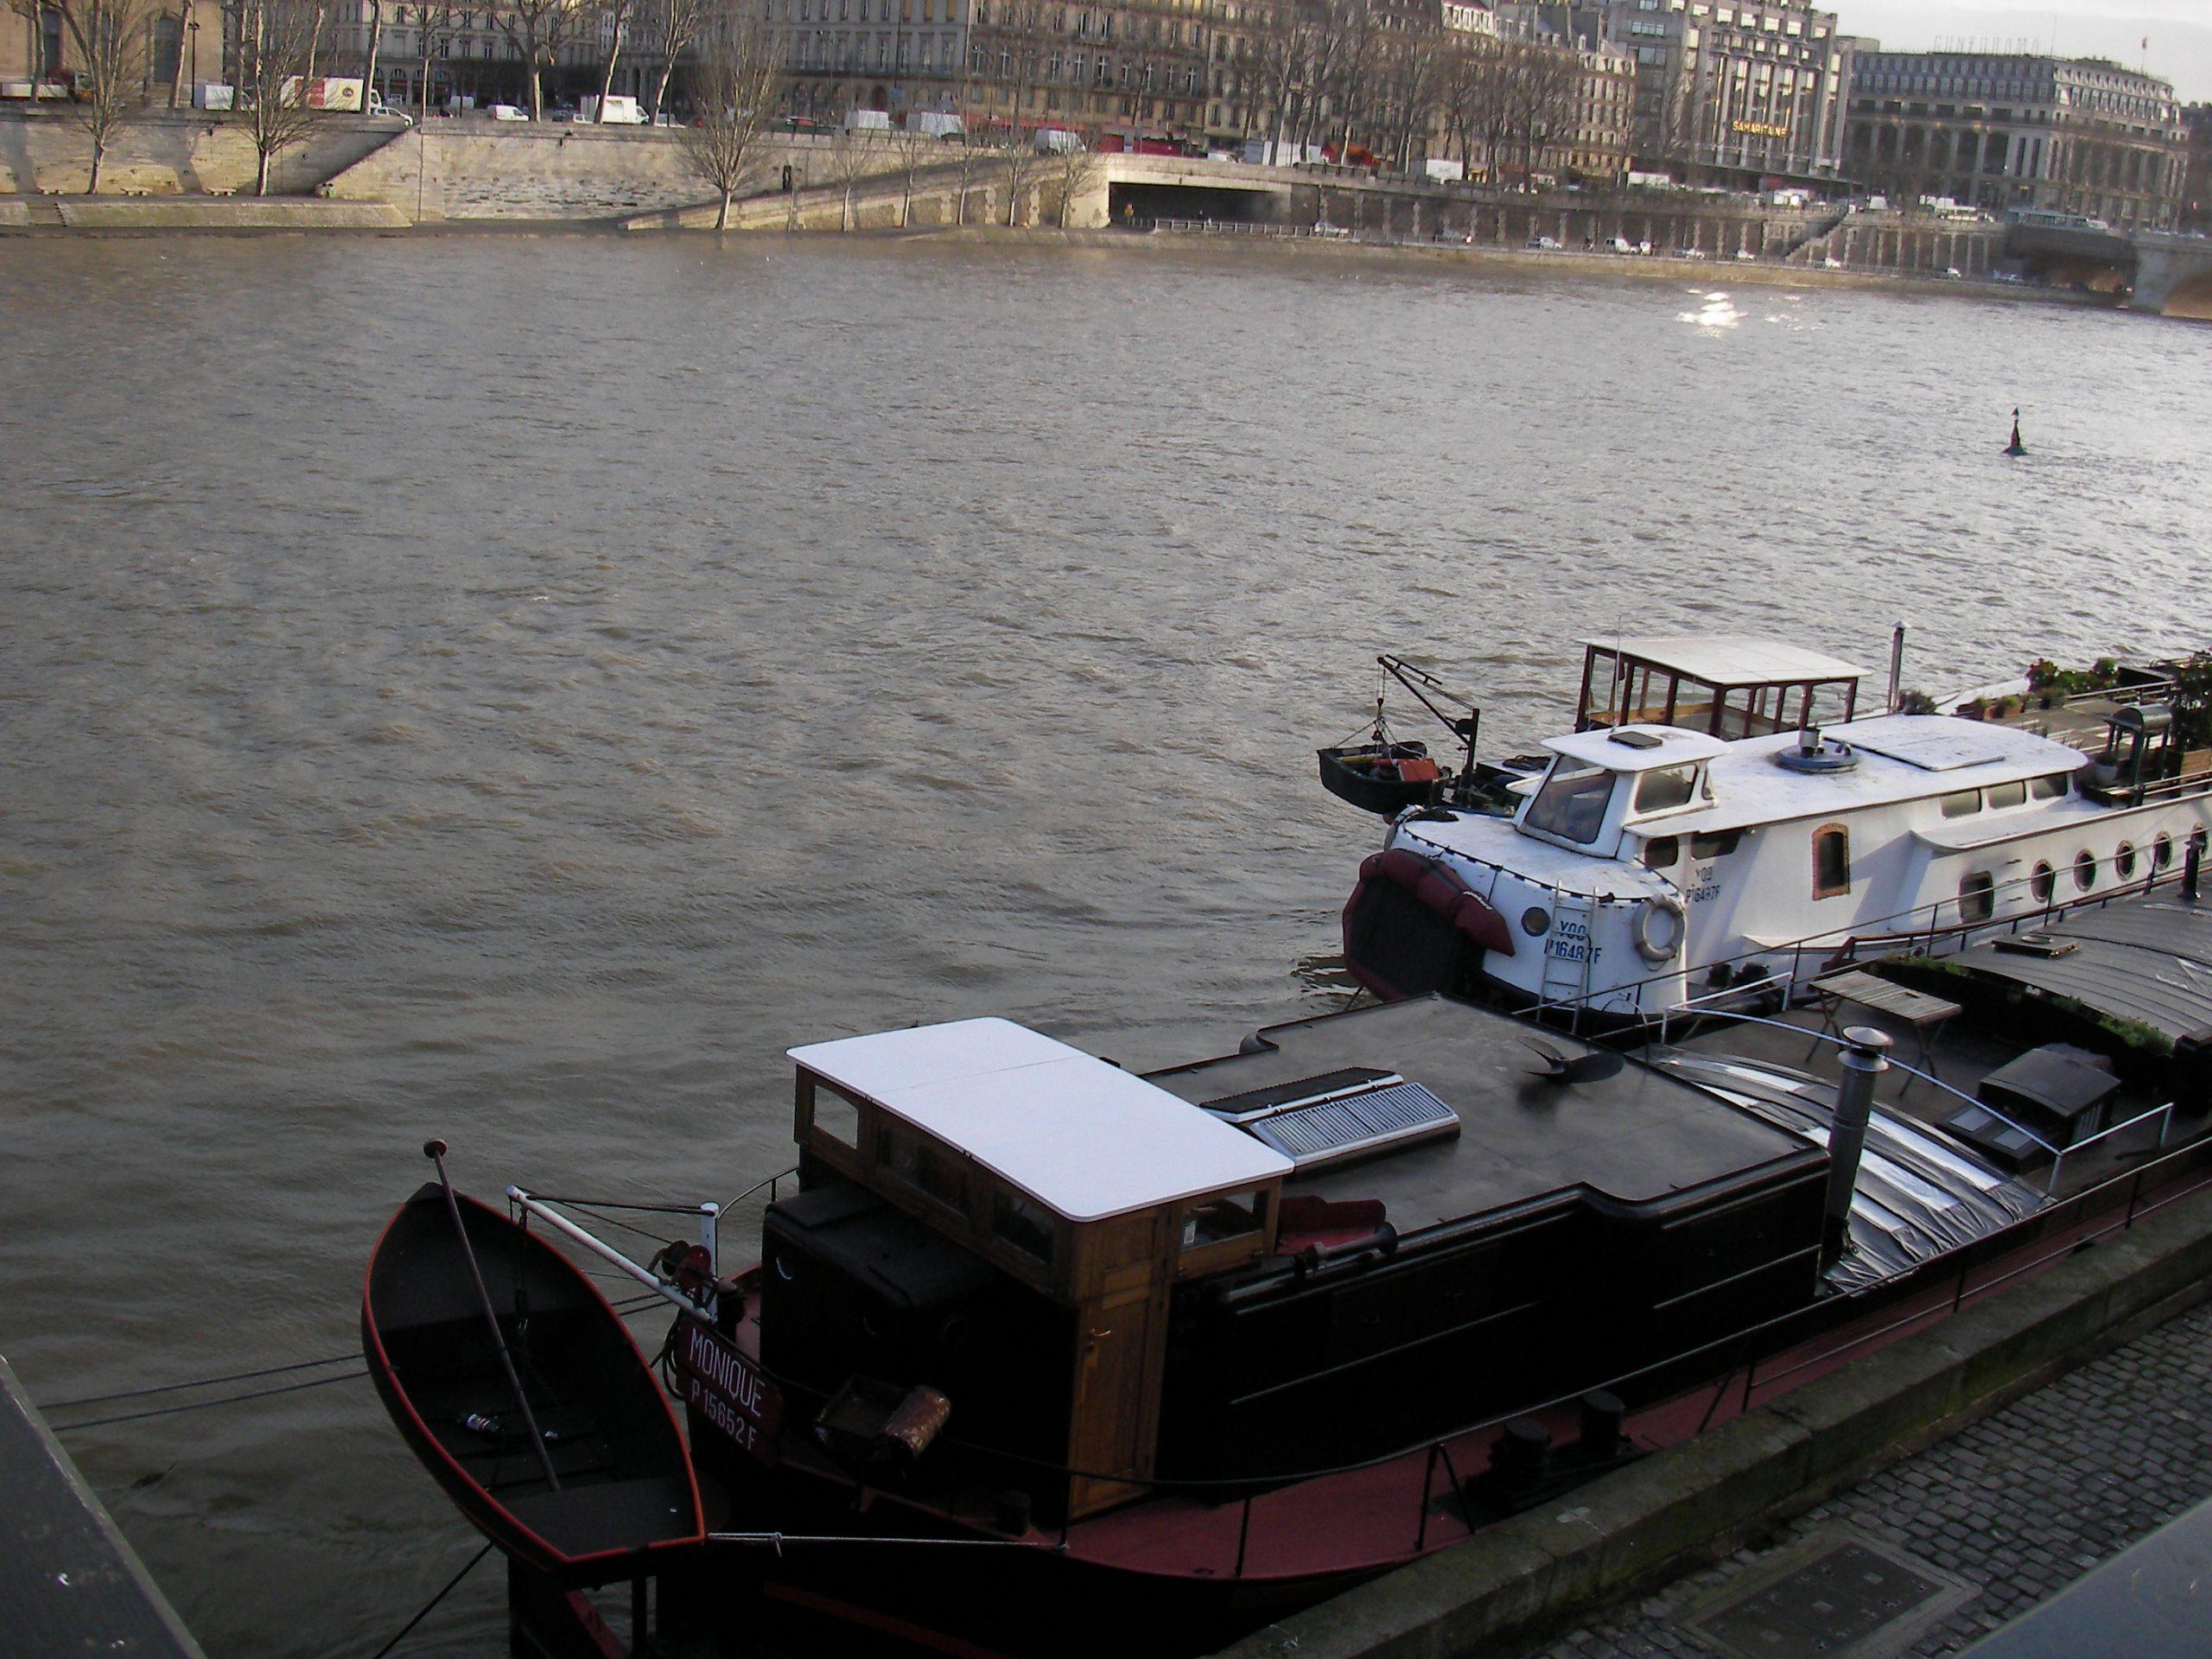 SANY0063 scaled - フランスで一番の長さの川はなんでしょう?